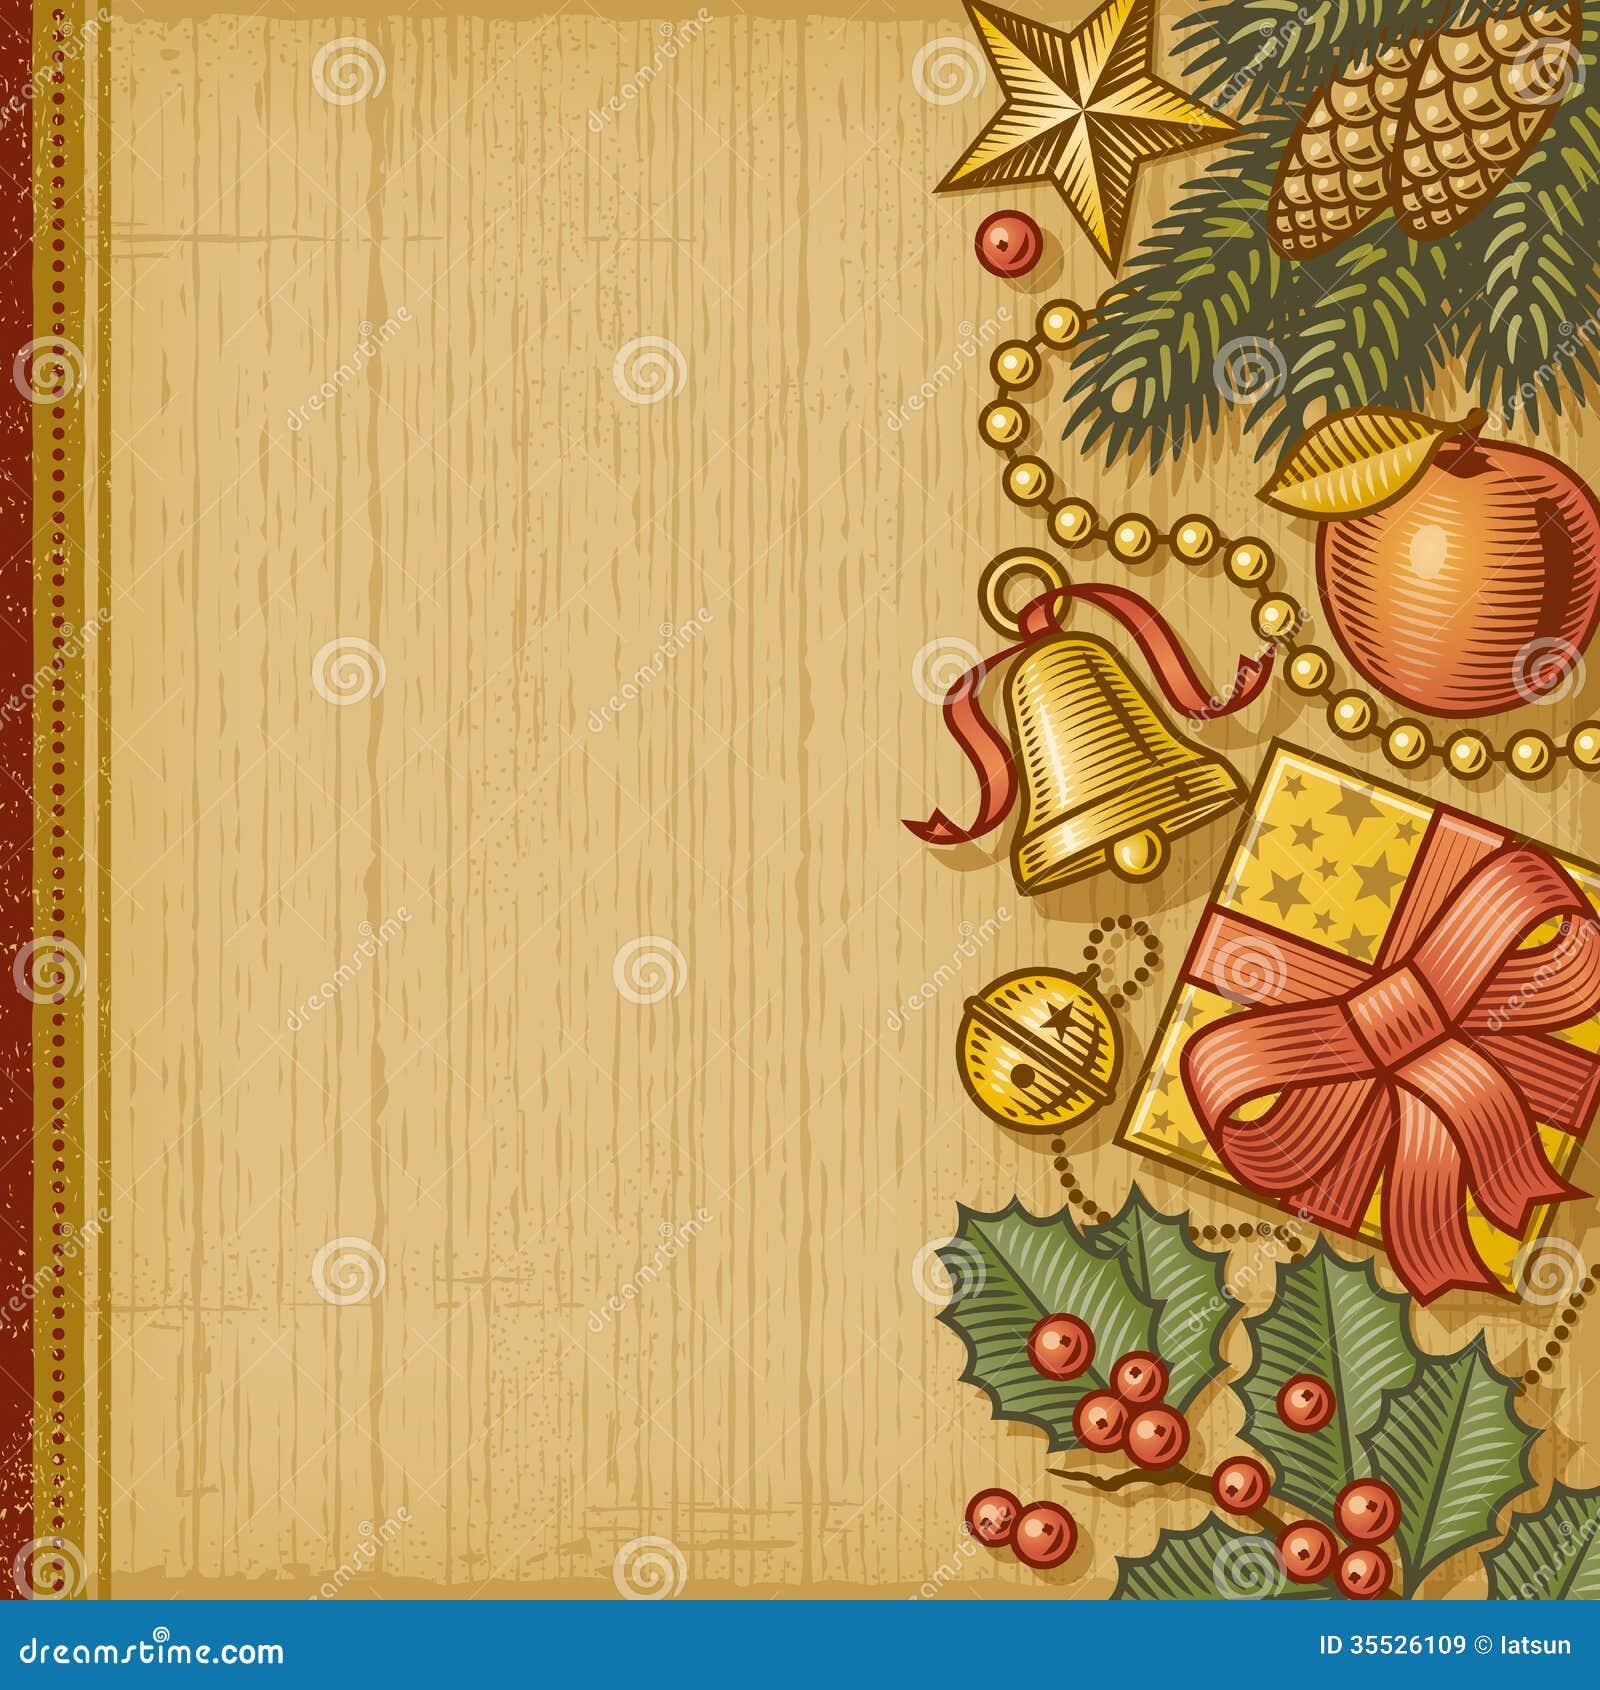 retro christmas background royalty free stock images